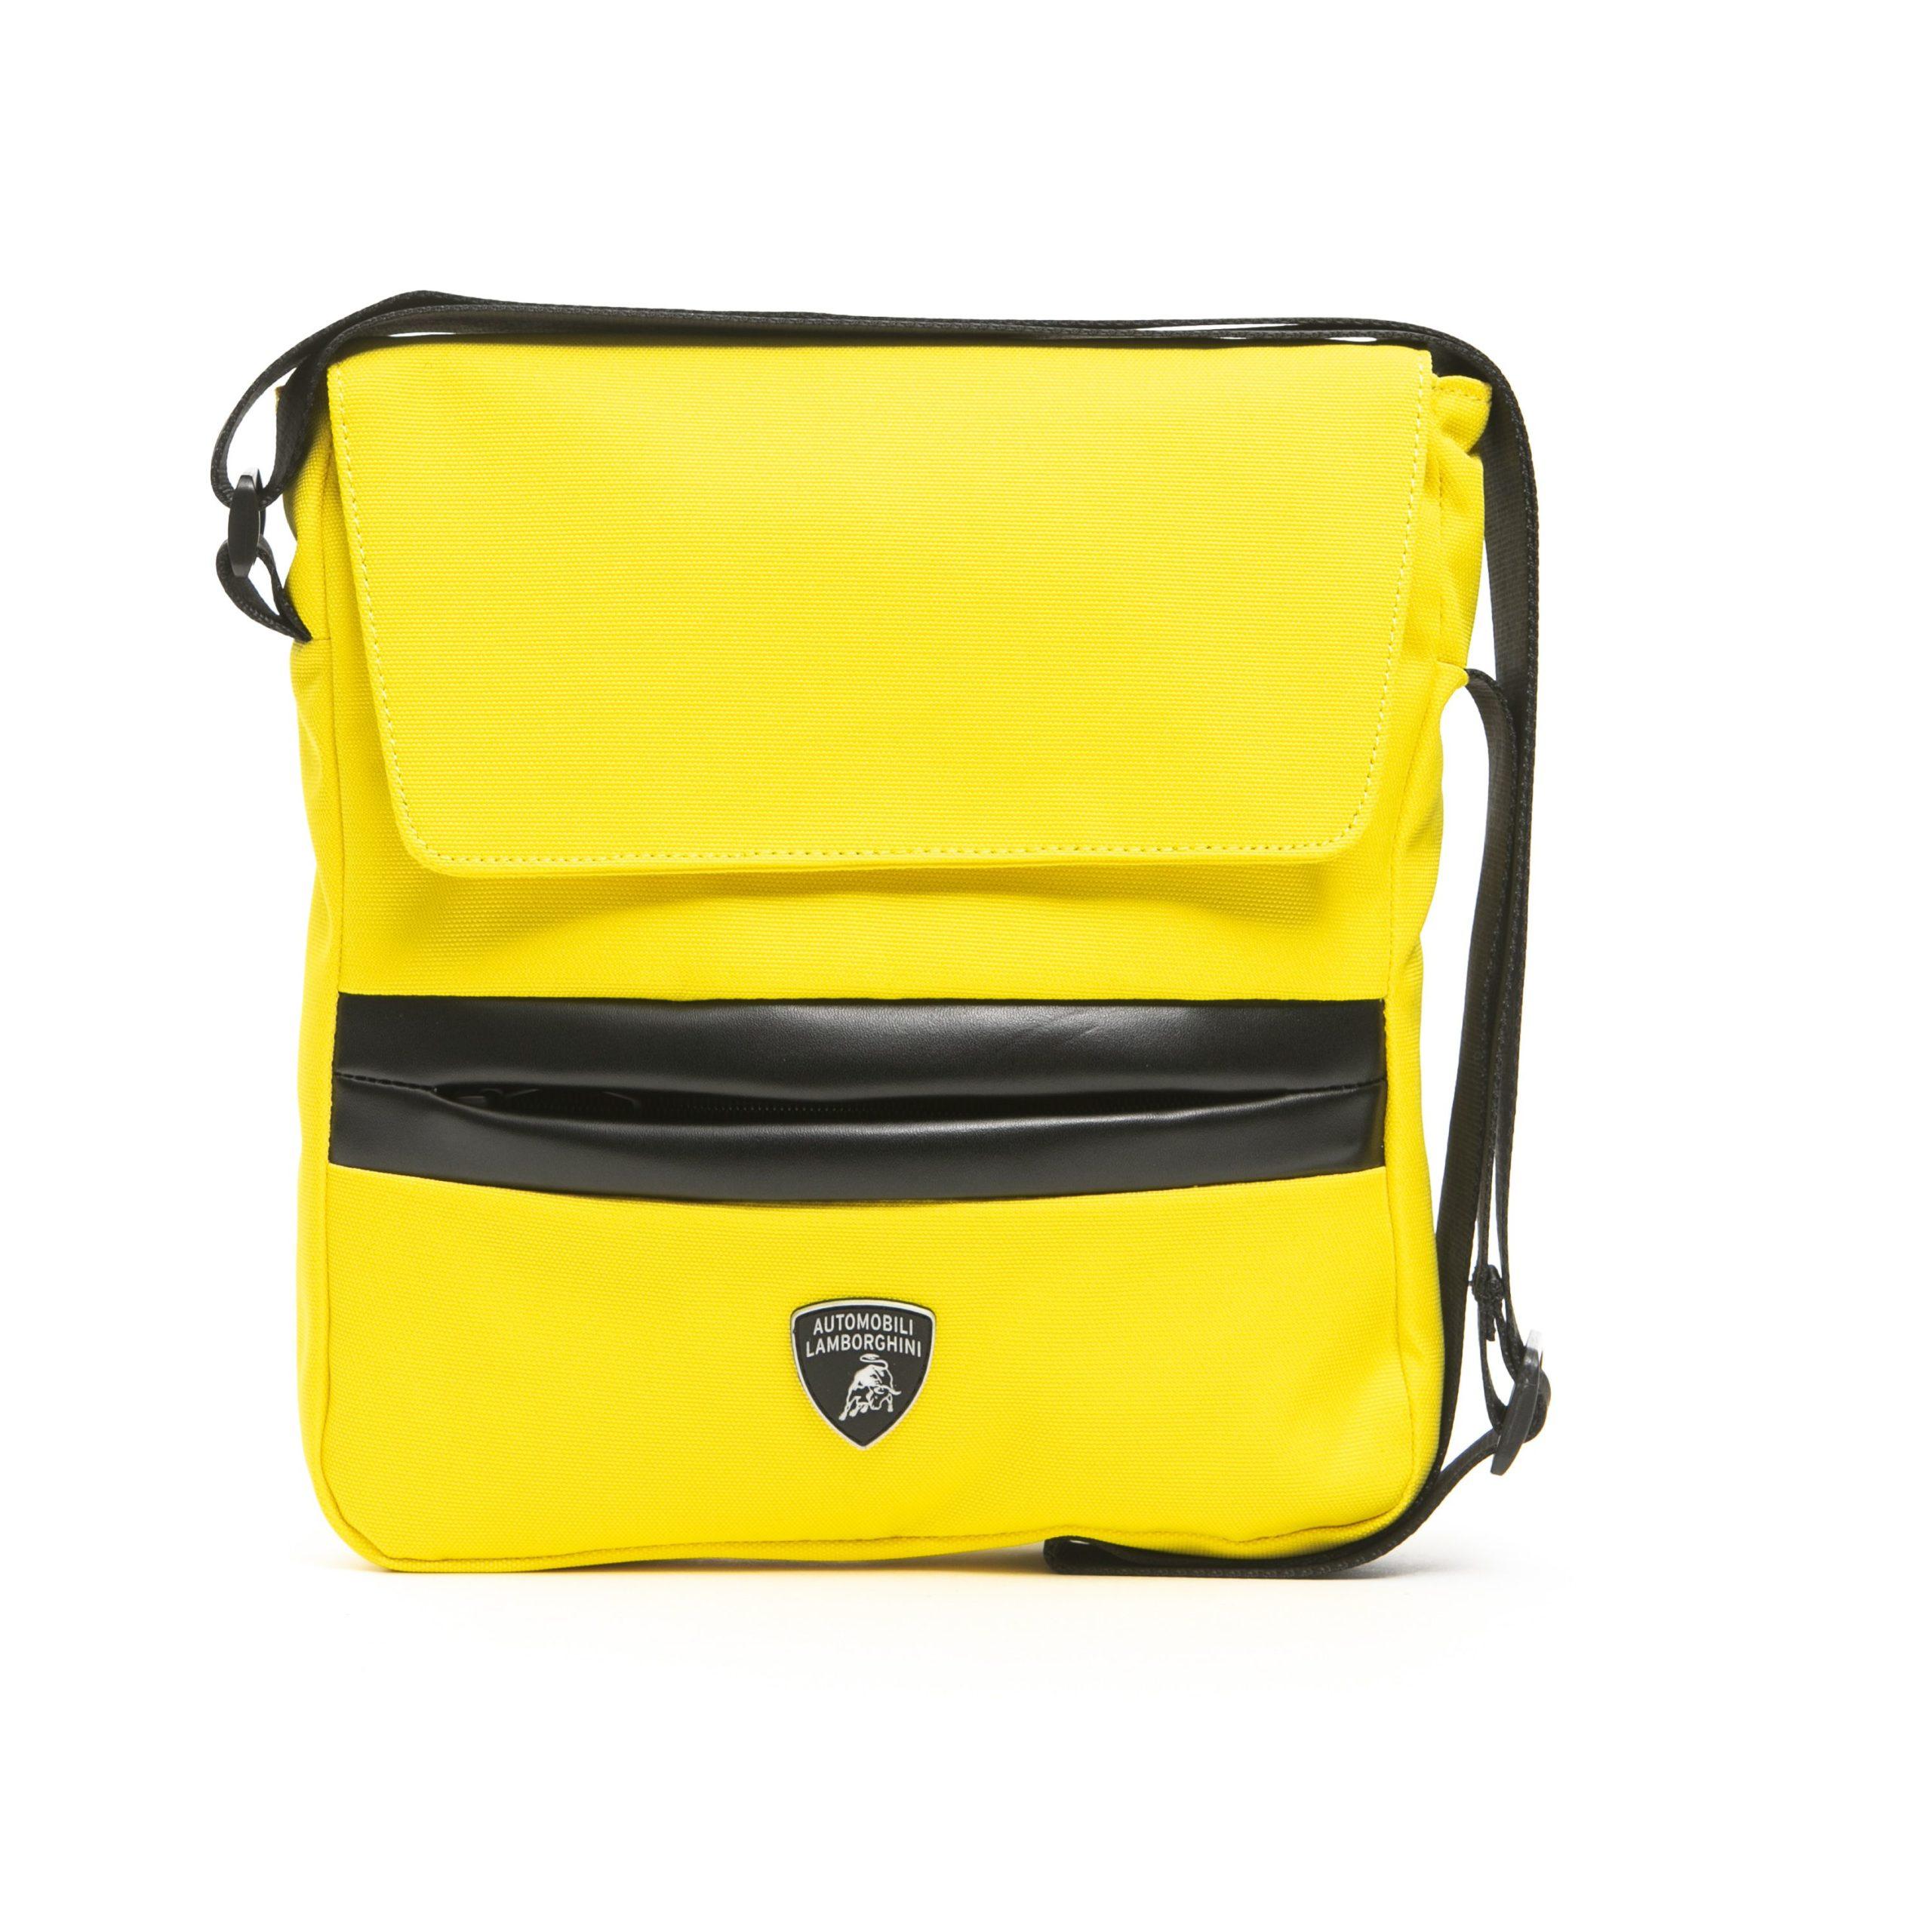 Lamborghini Men's Giallo Messenger Bag Yellow LA1265617